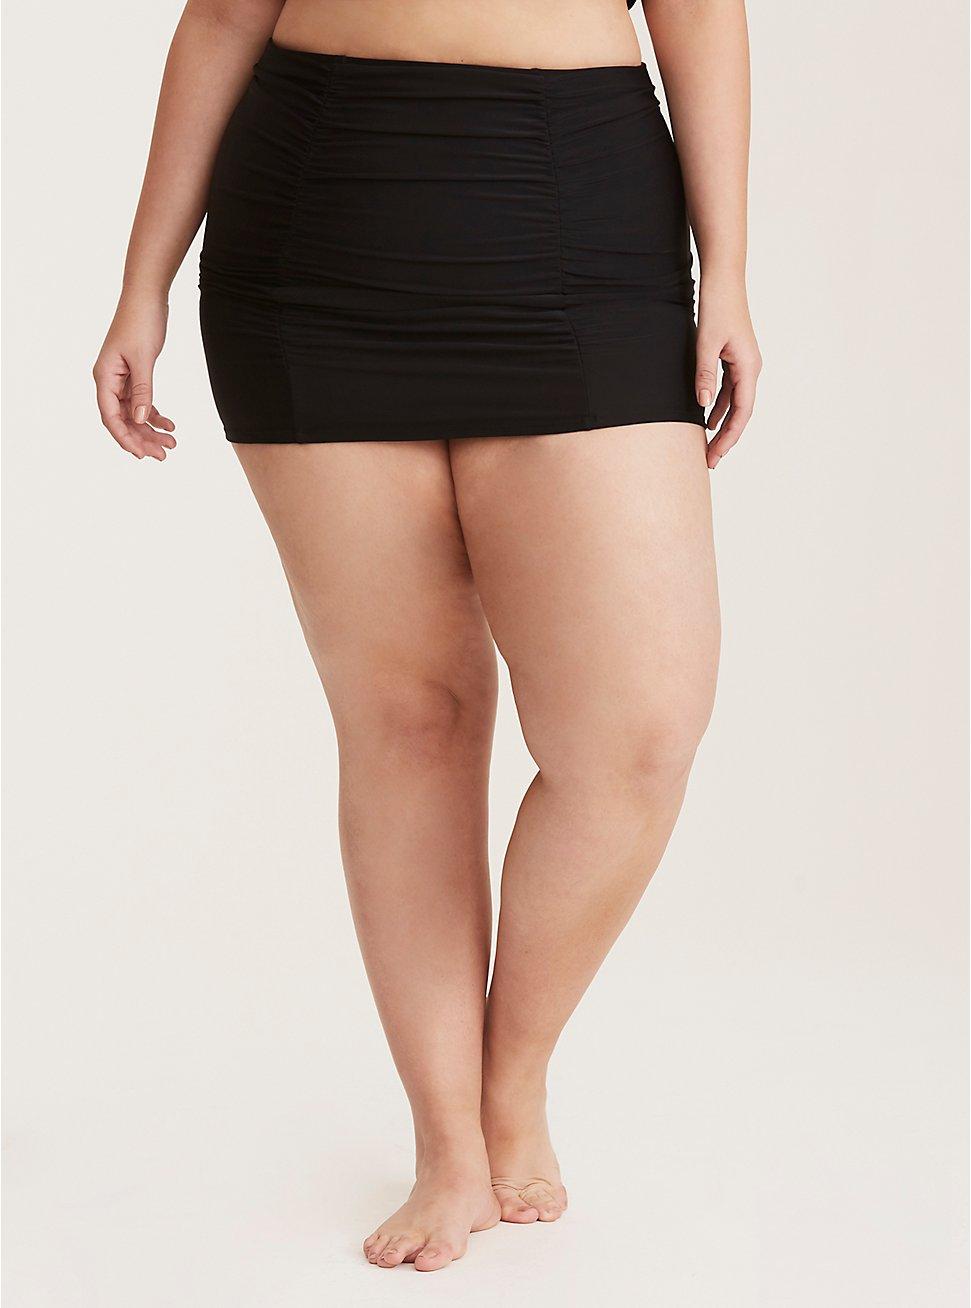 Plus Size Black Ruched High Waist Swim Skirt, BLACK, hi-res